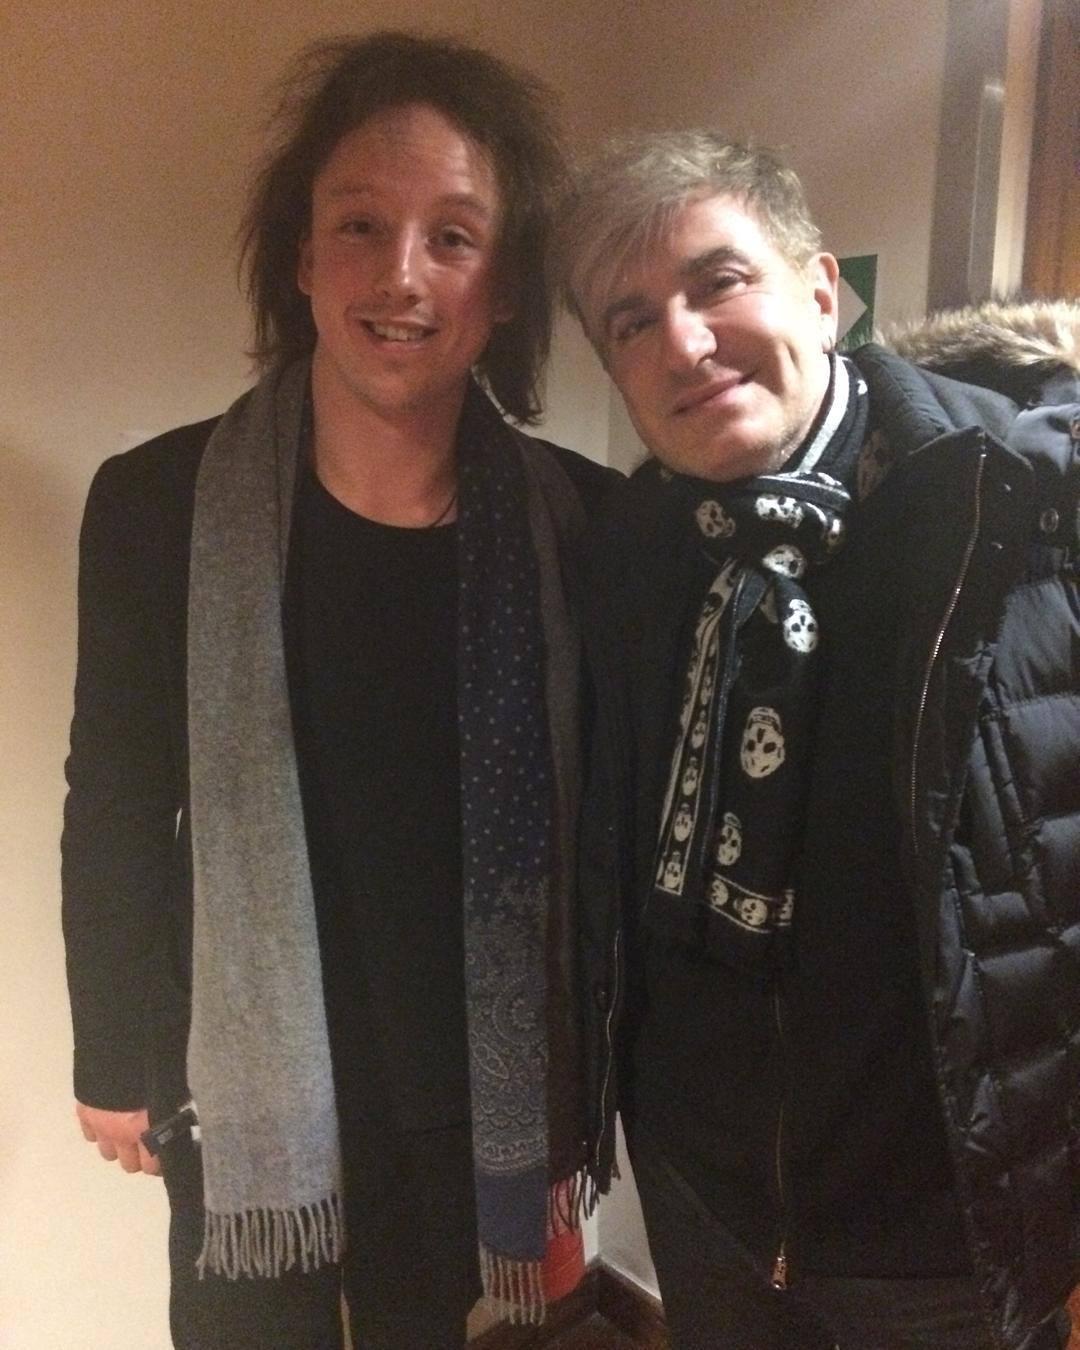 Oliver Poole & Jean-Yves Thibaudet